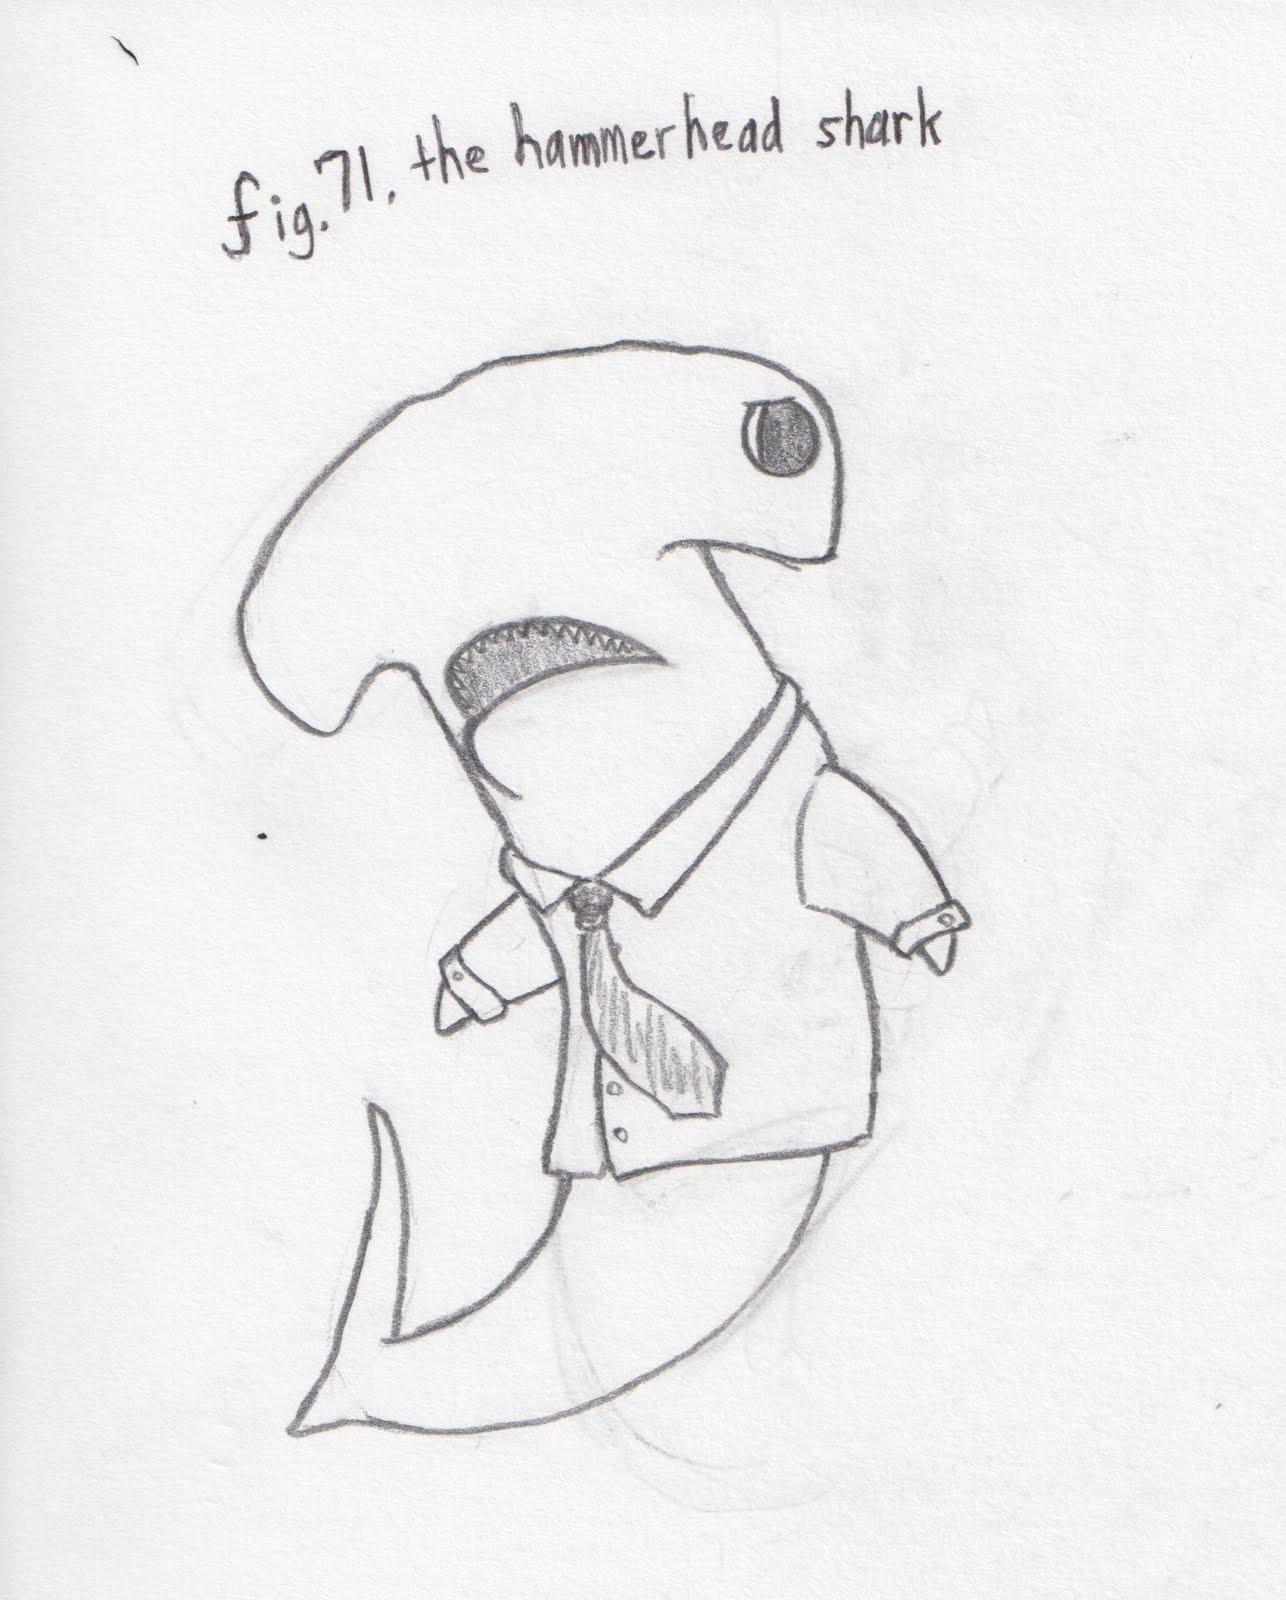 How To Draw A Hammerhead Shark   www.imgkid.com - The ...